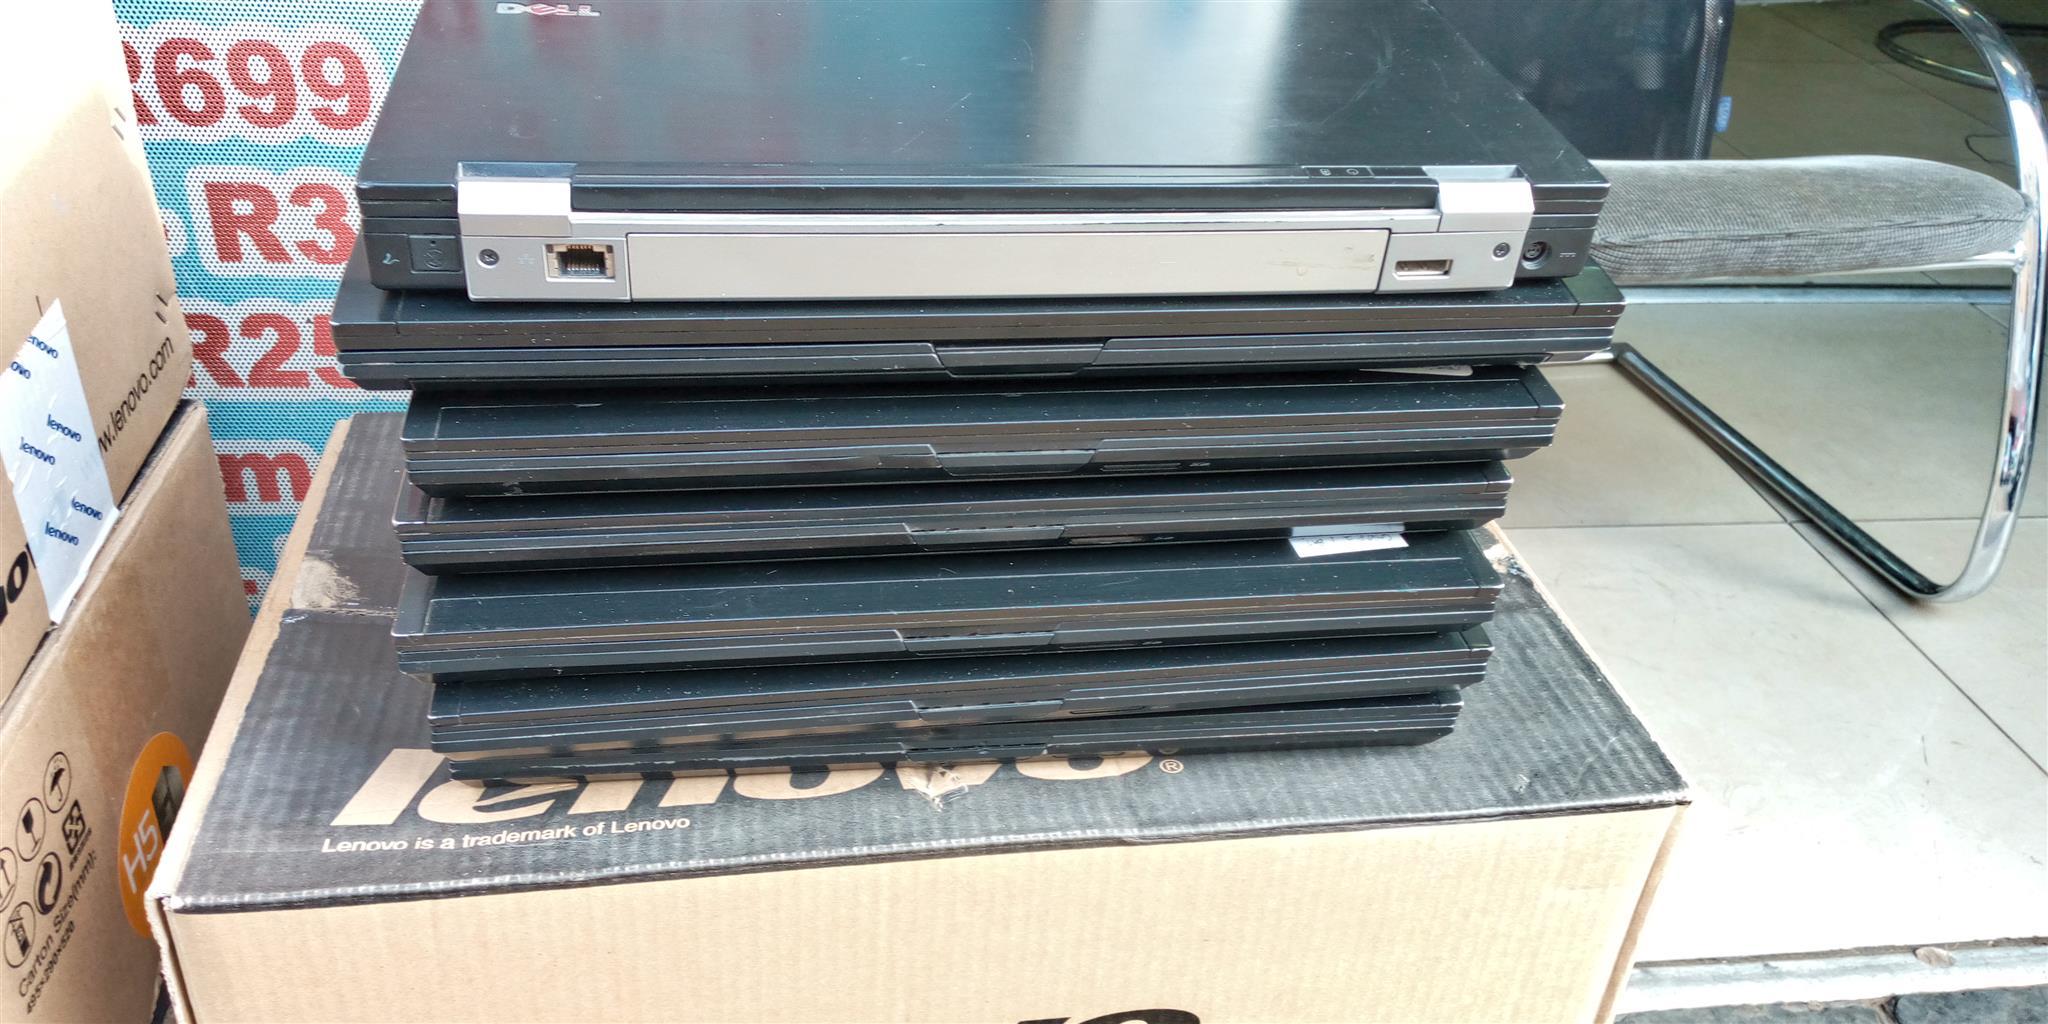 Dell latitude E6400 laptop slim an black with webcam